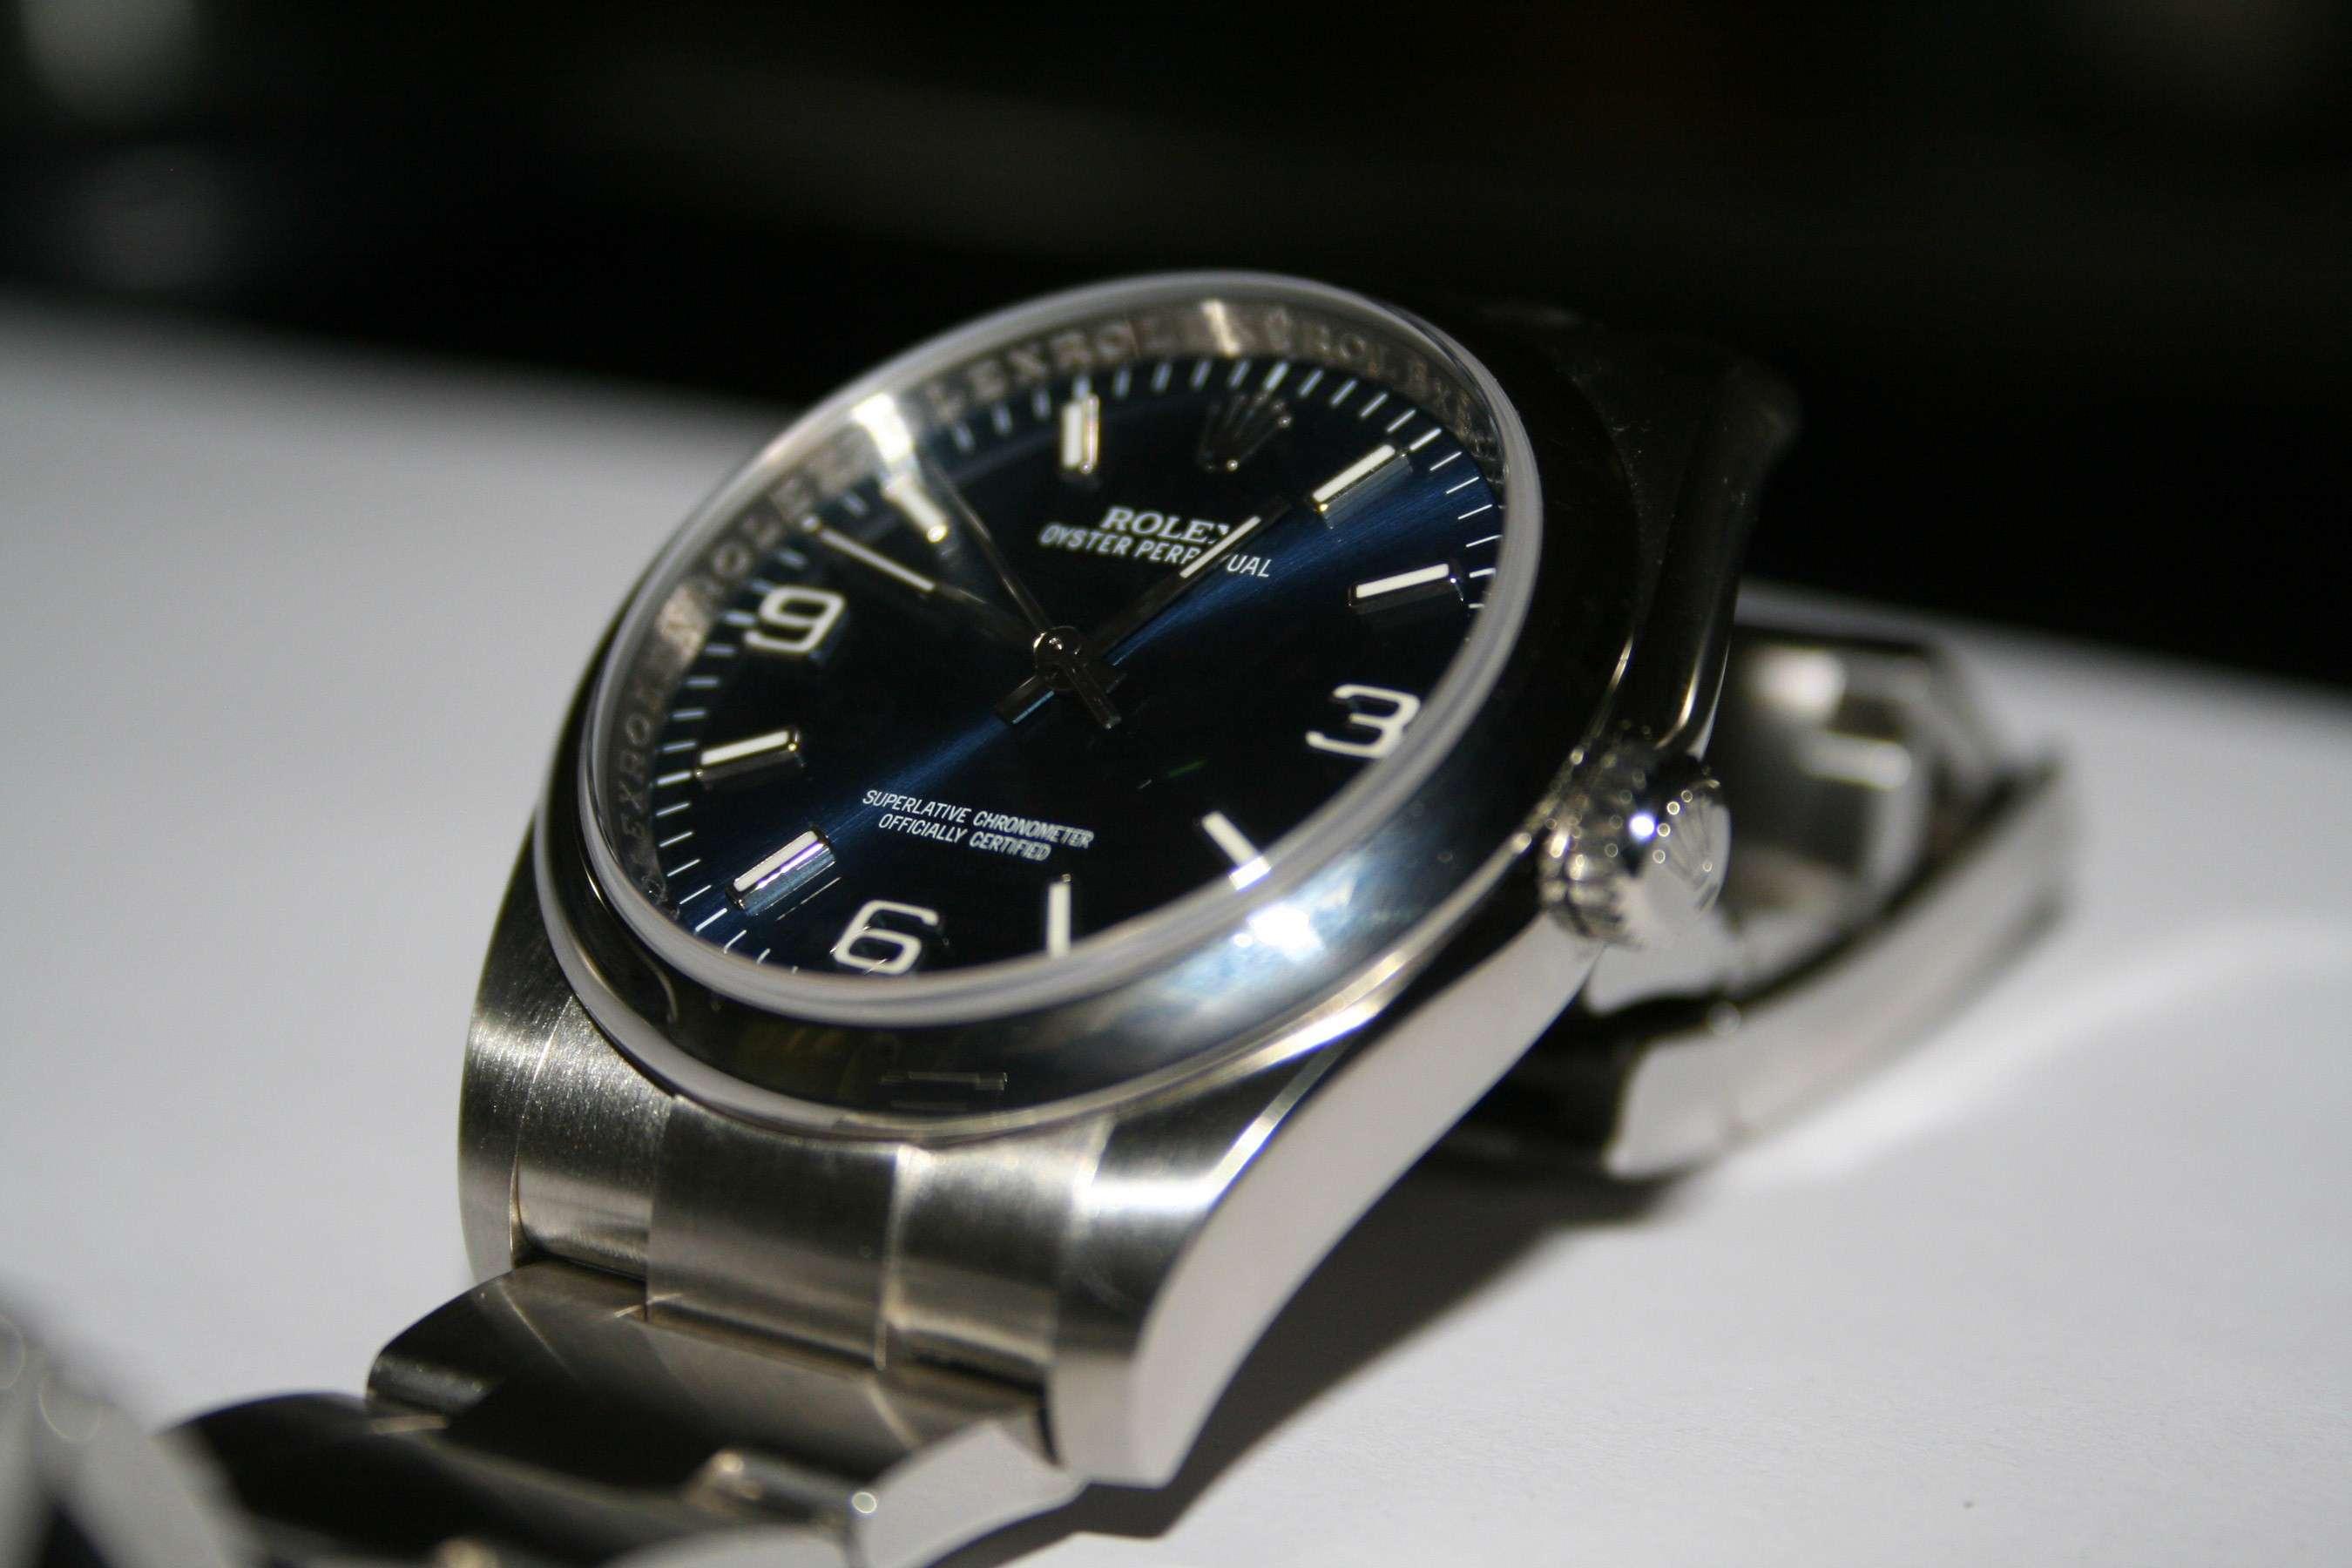 [Vends] Rolex Oyster Perpetual 116000 cadran bleu - comme neuve 211